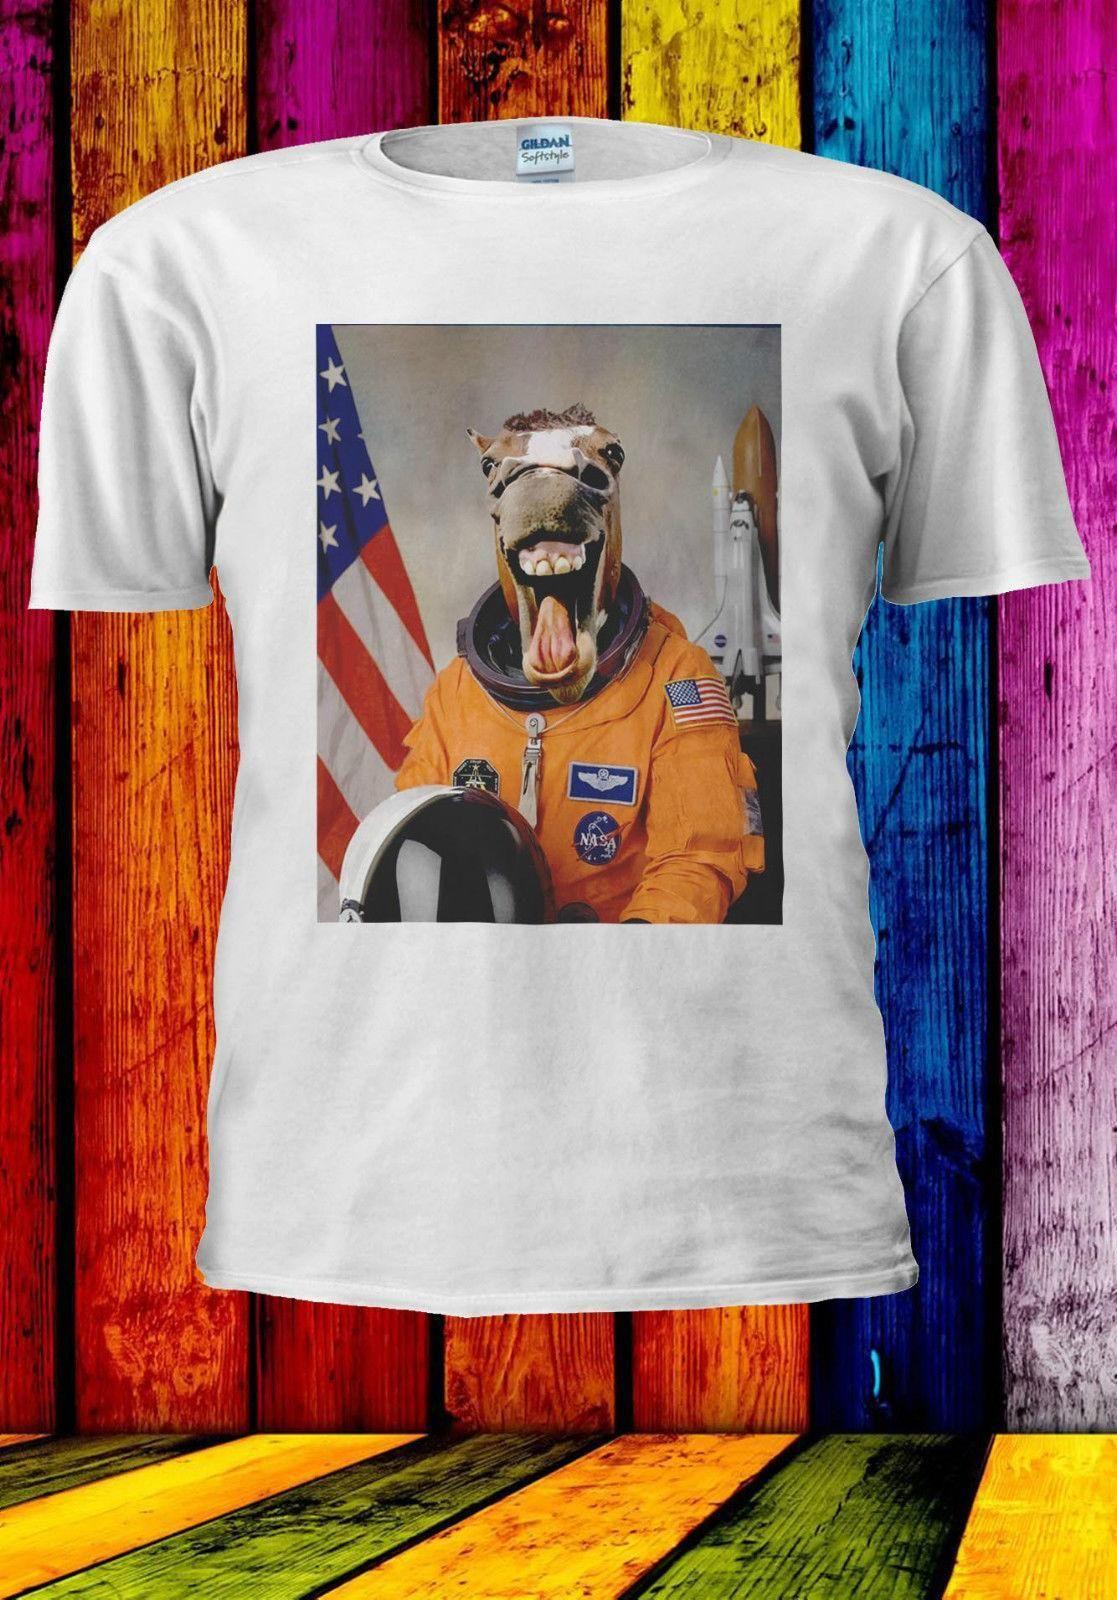 4c8541f6 Astronaut Funny Horse Laugh In Space T Shirt Vest Tank Top Men Women Unisex  538 Shop T Shirt Online Interesting T Shirt From Linnan00003, $14.67|  DHgate.Com